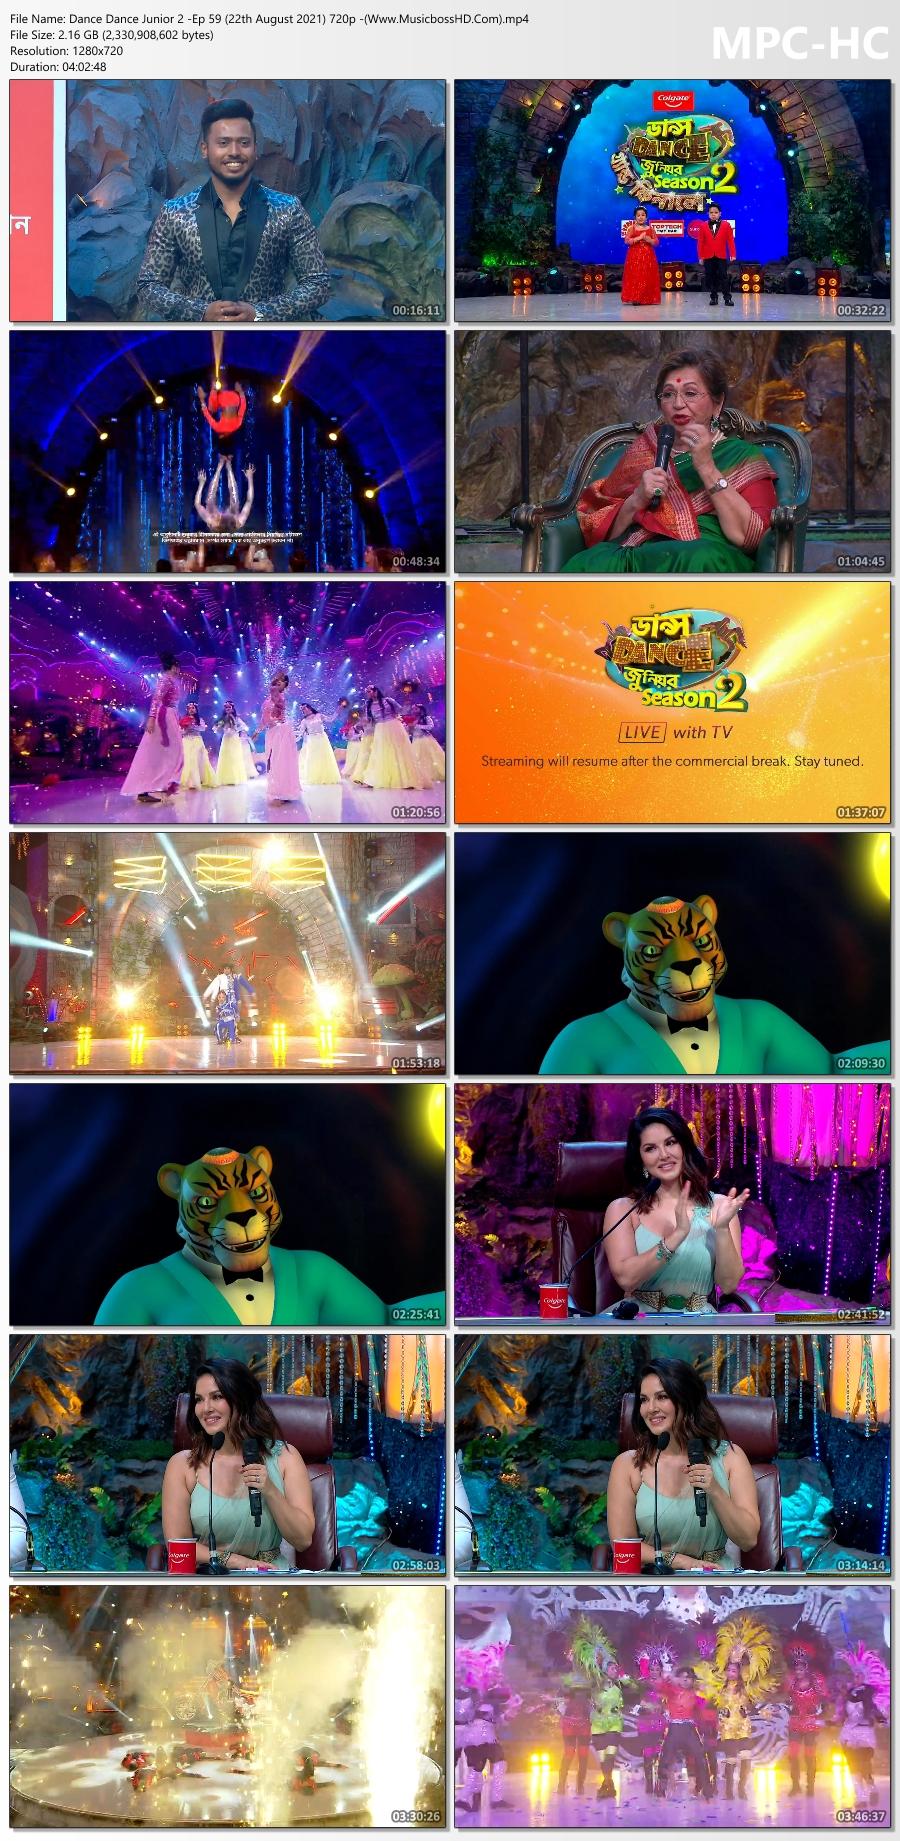 Dance-Dance-Junior-2-Ep-59-22th-August-2021-720p-Www-Musicboss-HD-Com-mp4-thumbs